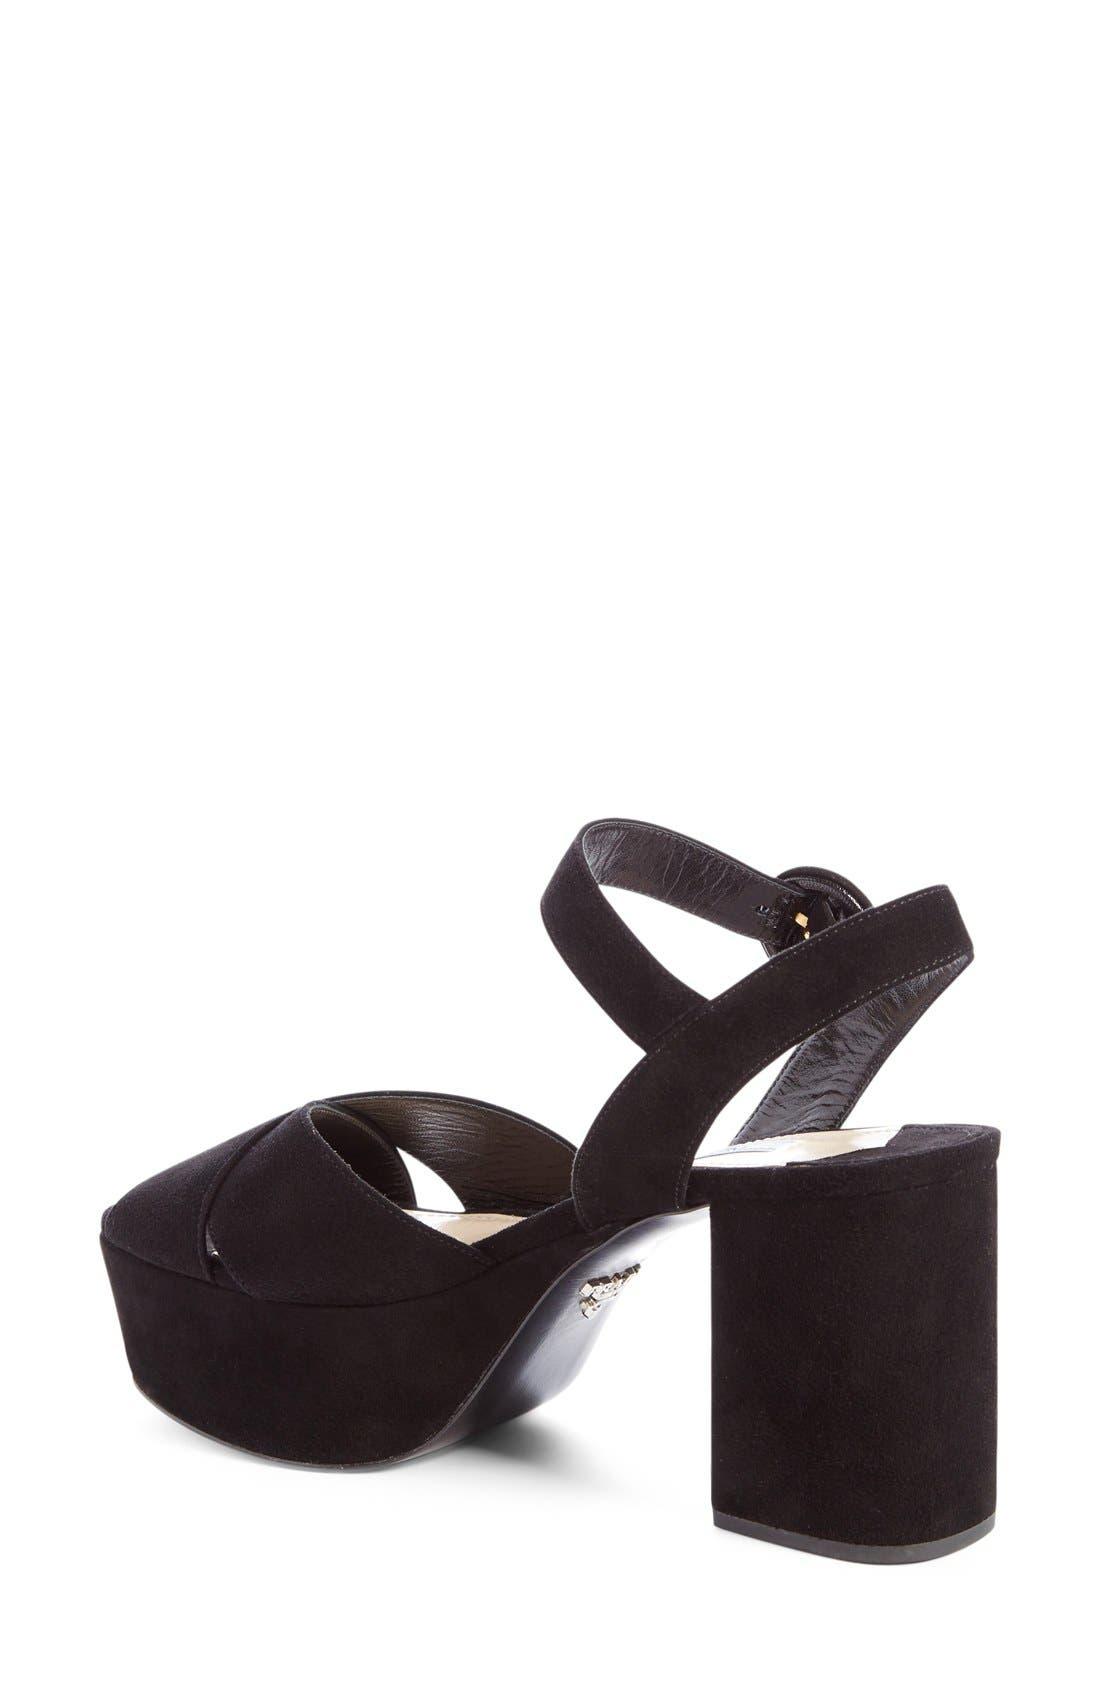 Strappy Platform Sandal,                             Main thumbnail 1, color,                             001